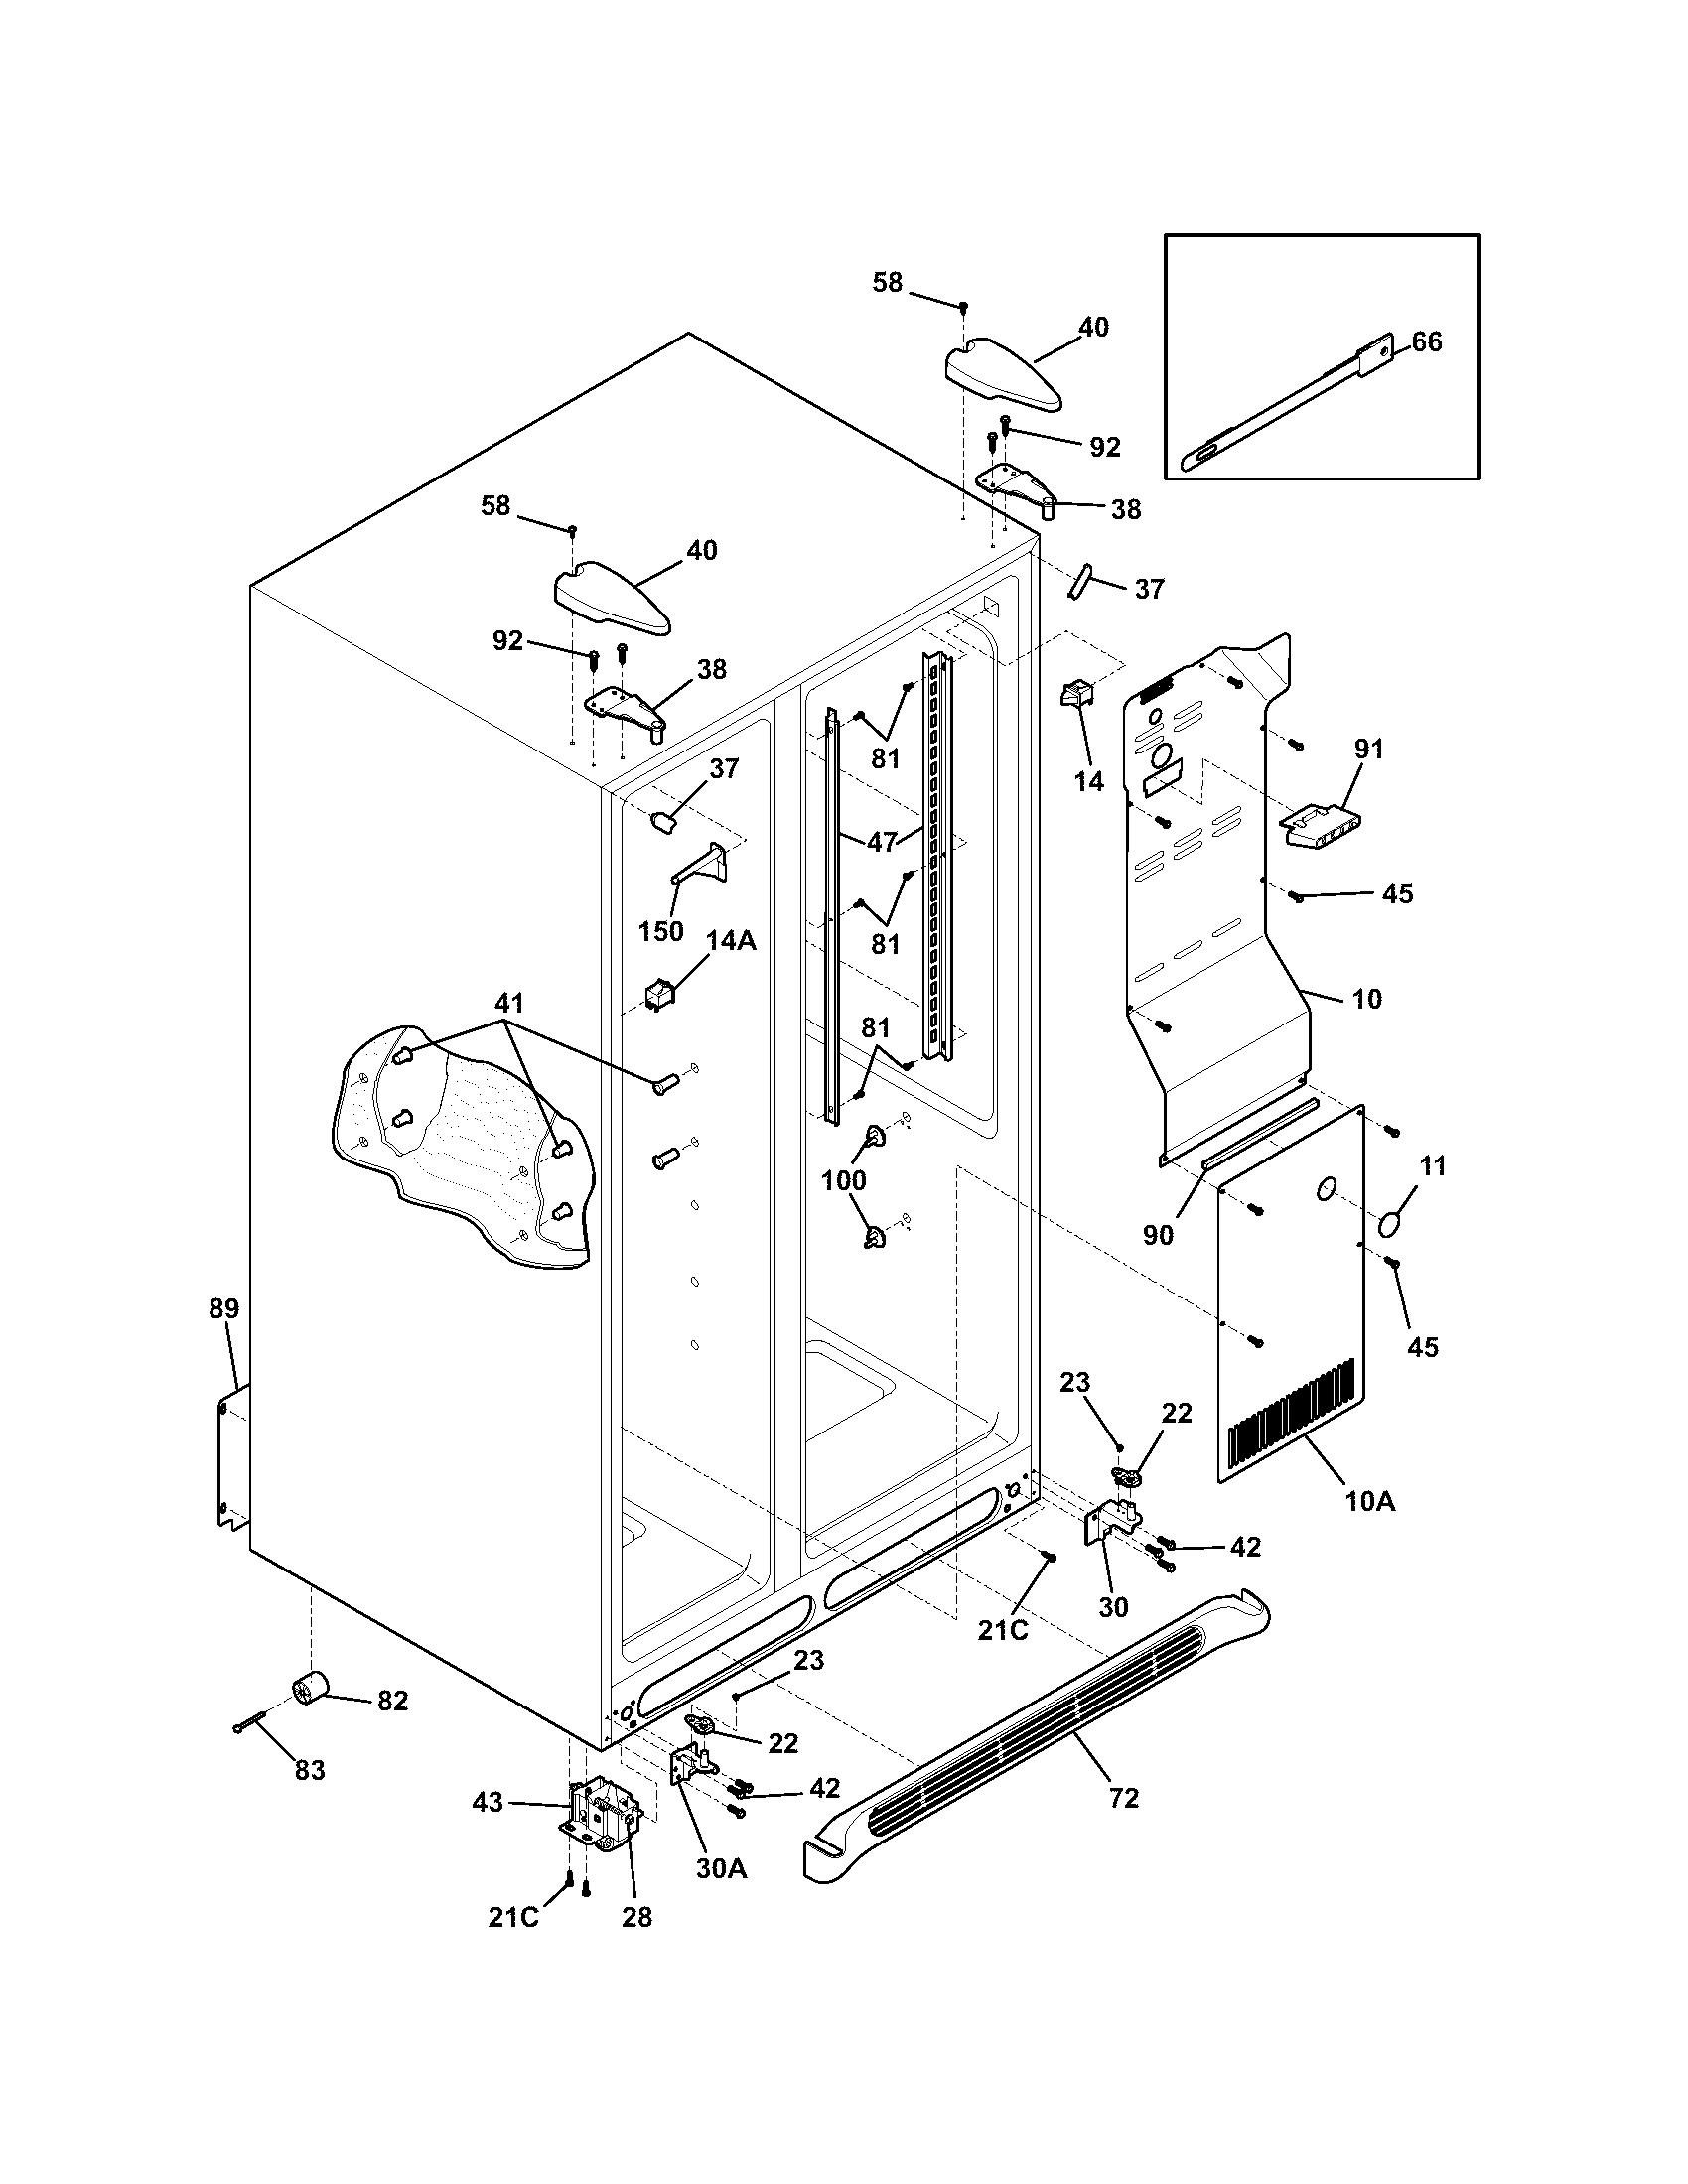 maytag refrigerator wiring diagram maytag refrigerator ice maker